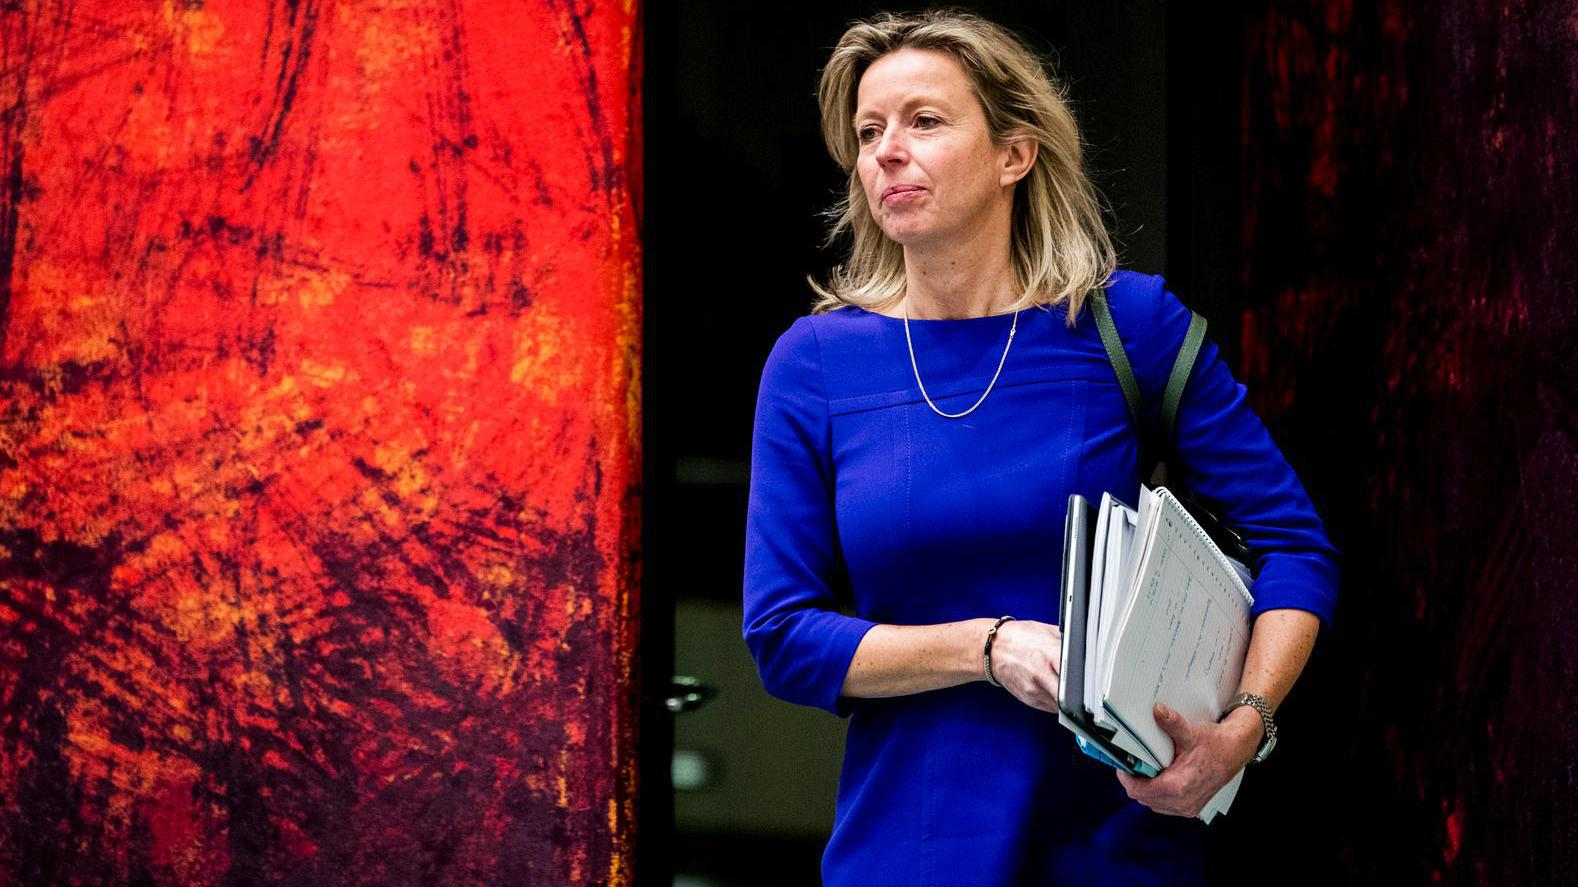 Wethouder Ivens: 'Minister Ollongren, help ons toch'